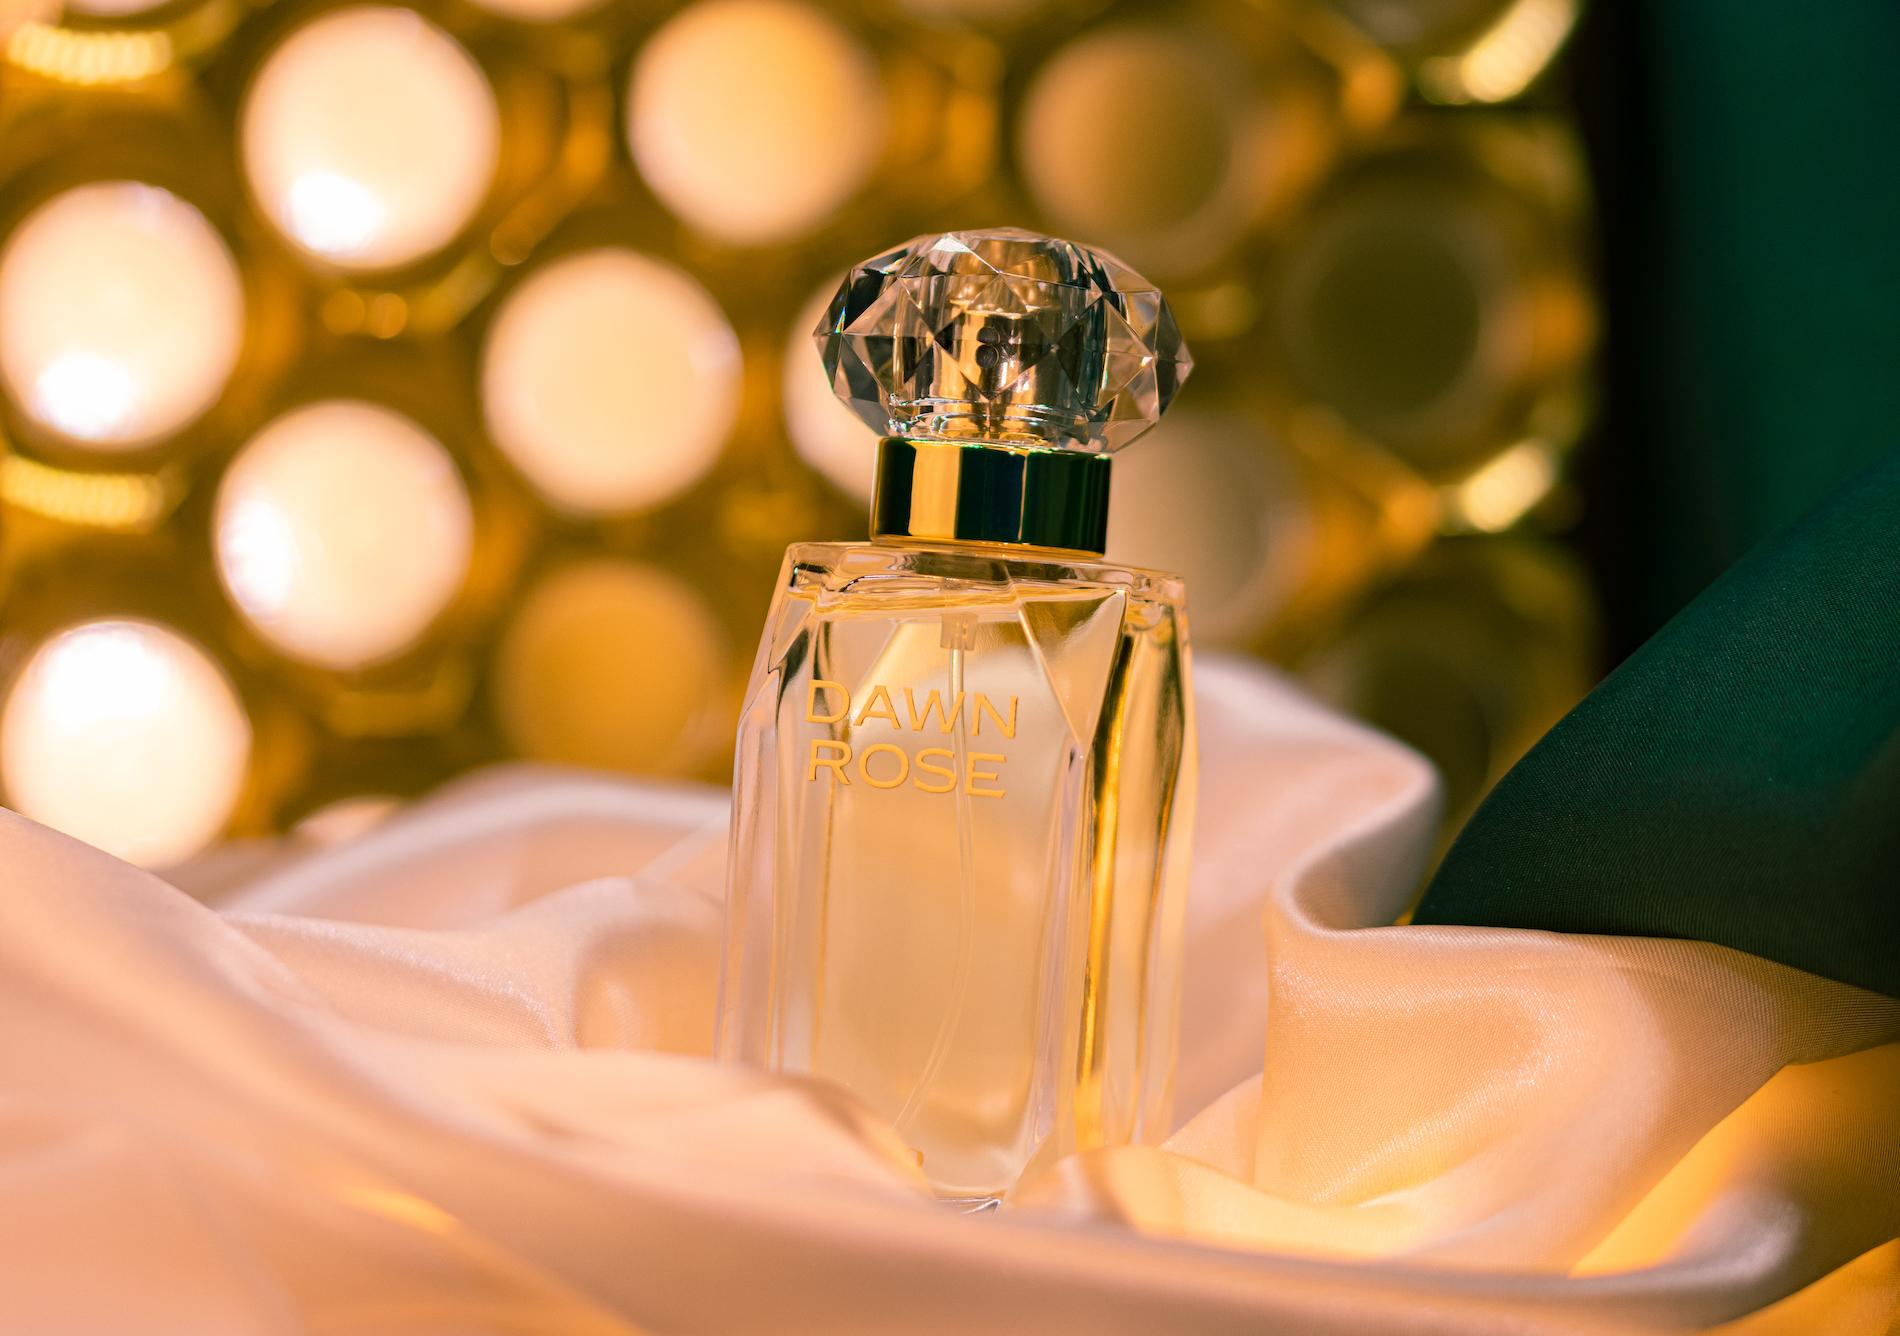 Down Rosa Perfume